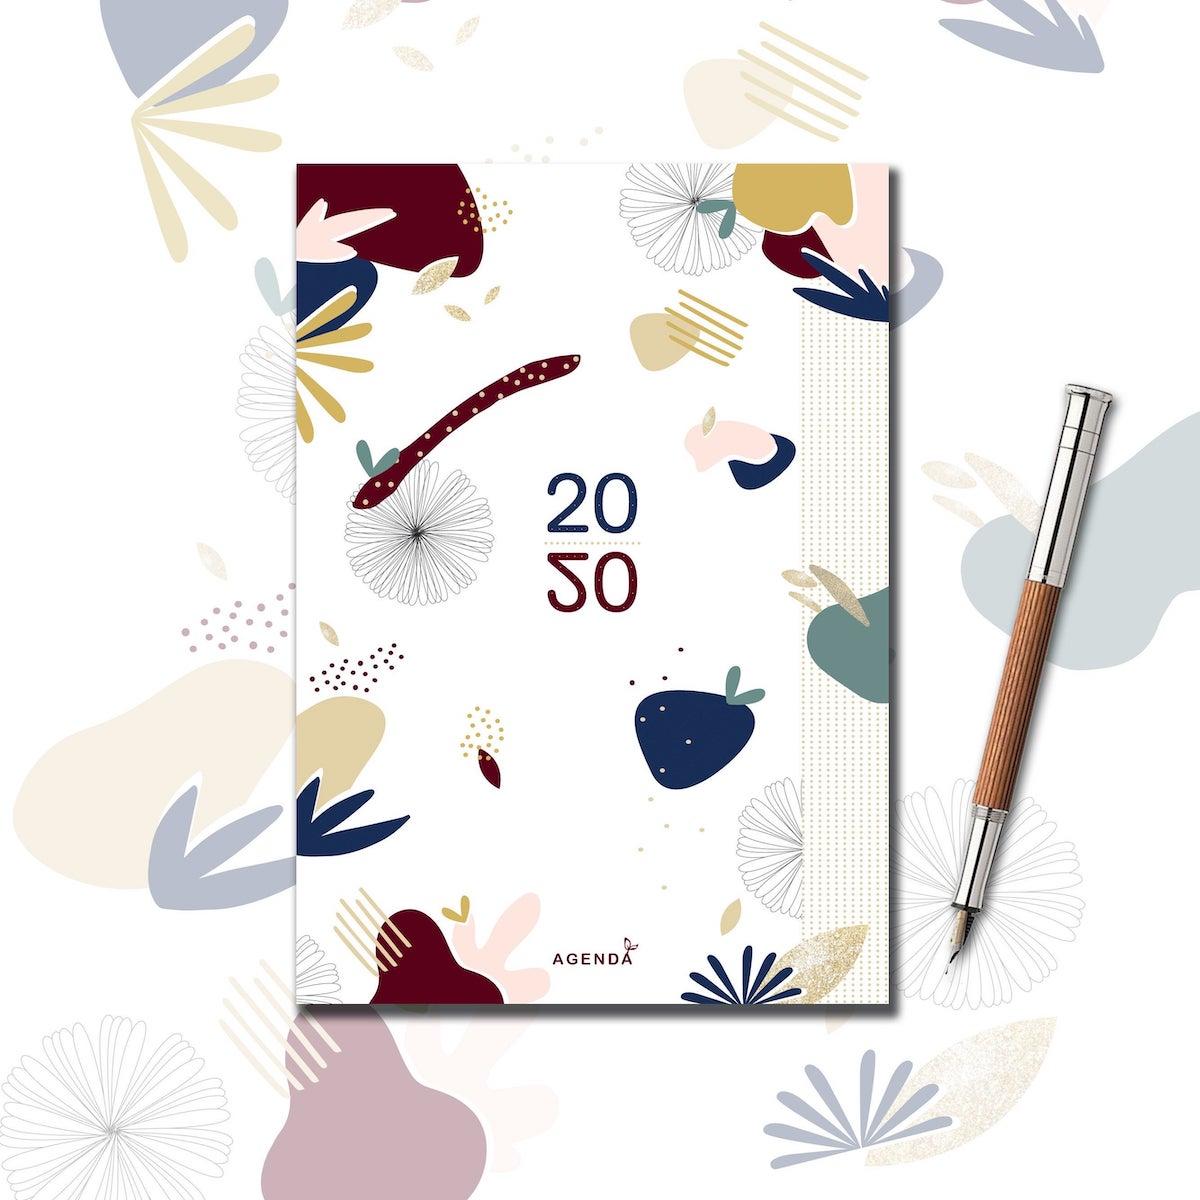 agenda 2020 illustration abstraite originale blog déco